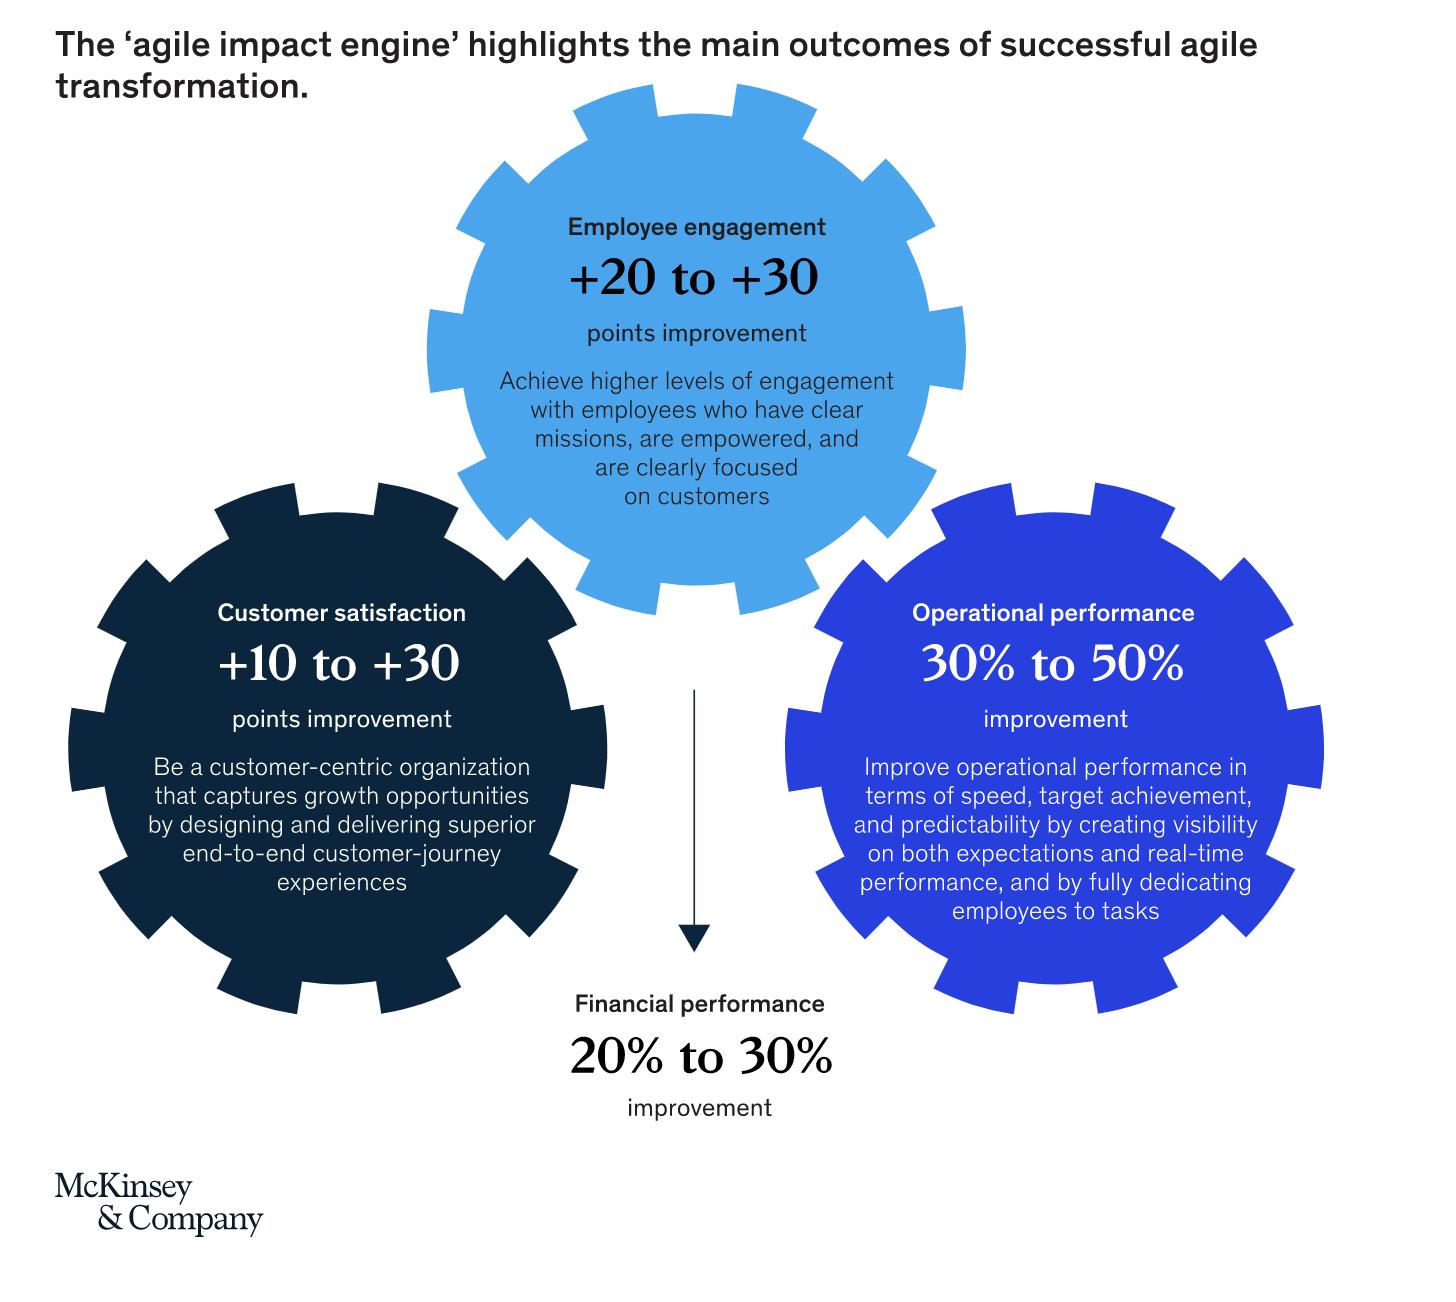 The agile impact engine - higlighting the main outcomes of successful agile transformation